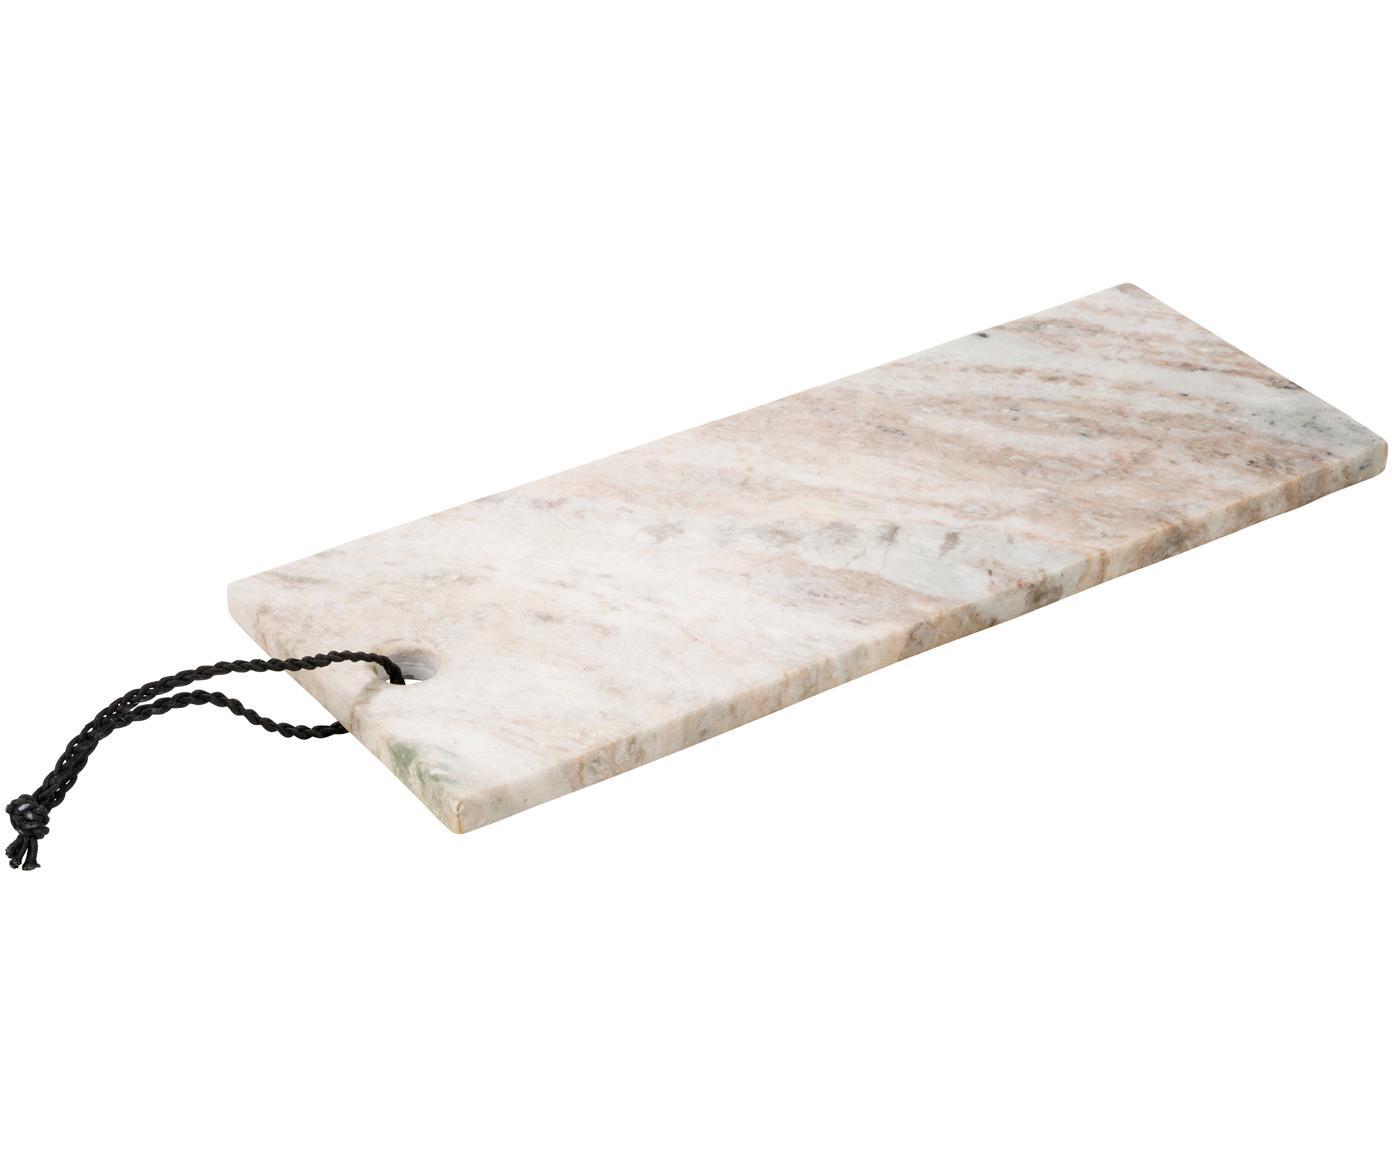 Tabla de cortar de mármol Torrant, Mármol, Tonos beige, blanco, An 40 x F 15 cm